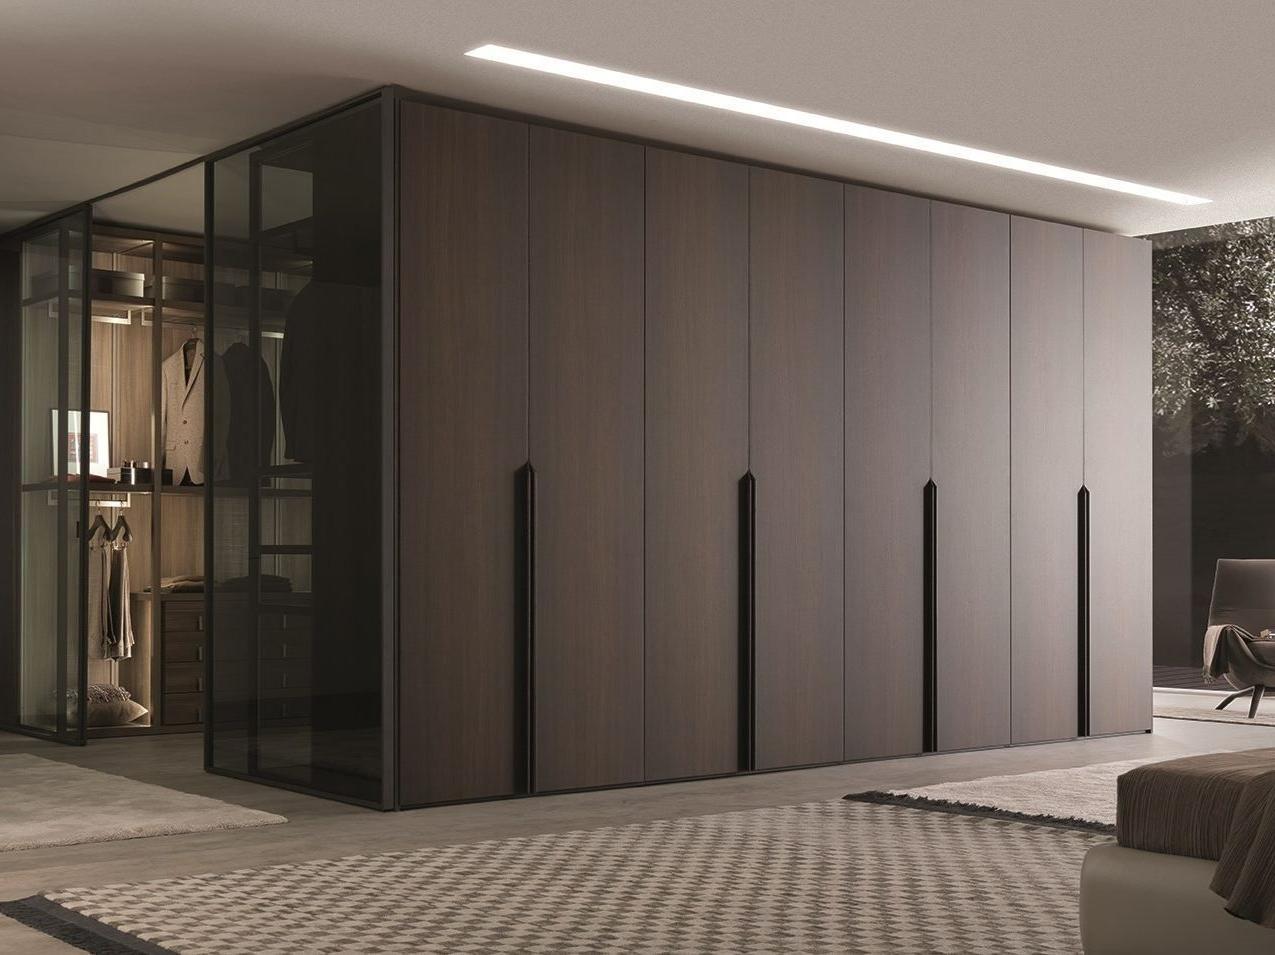 Fashionable Solid Wood Built In Wardrobes With Regard To Milano Armario De Madera Macizamisuraemme / Idea Para Separar (View 4 of 15)